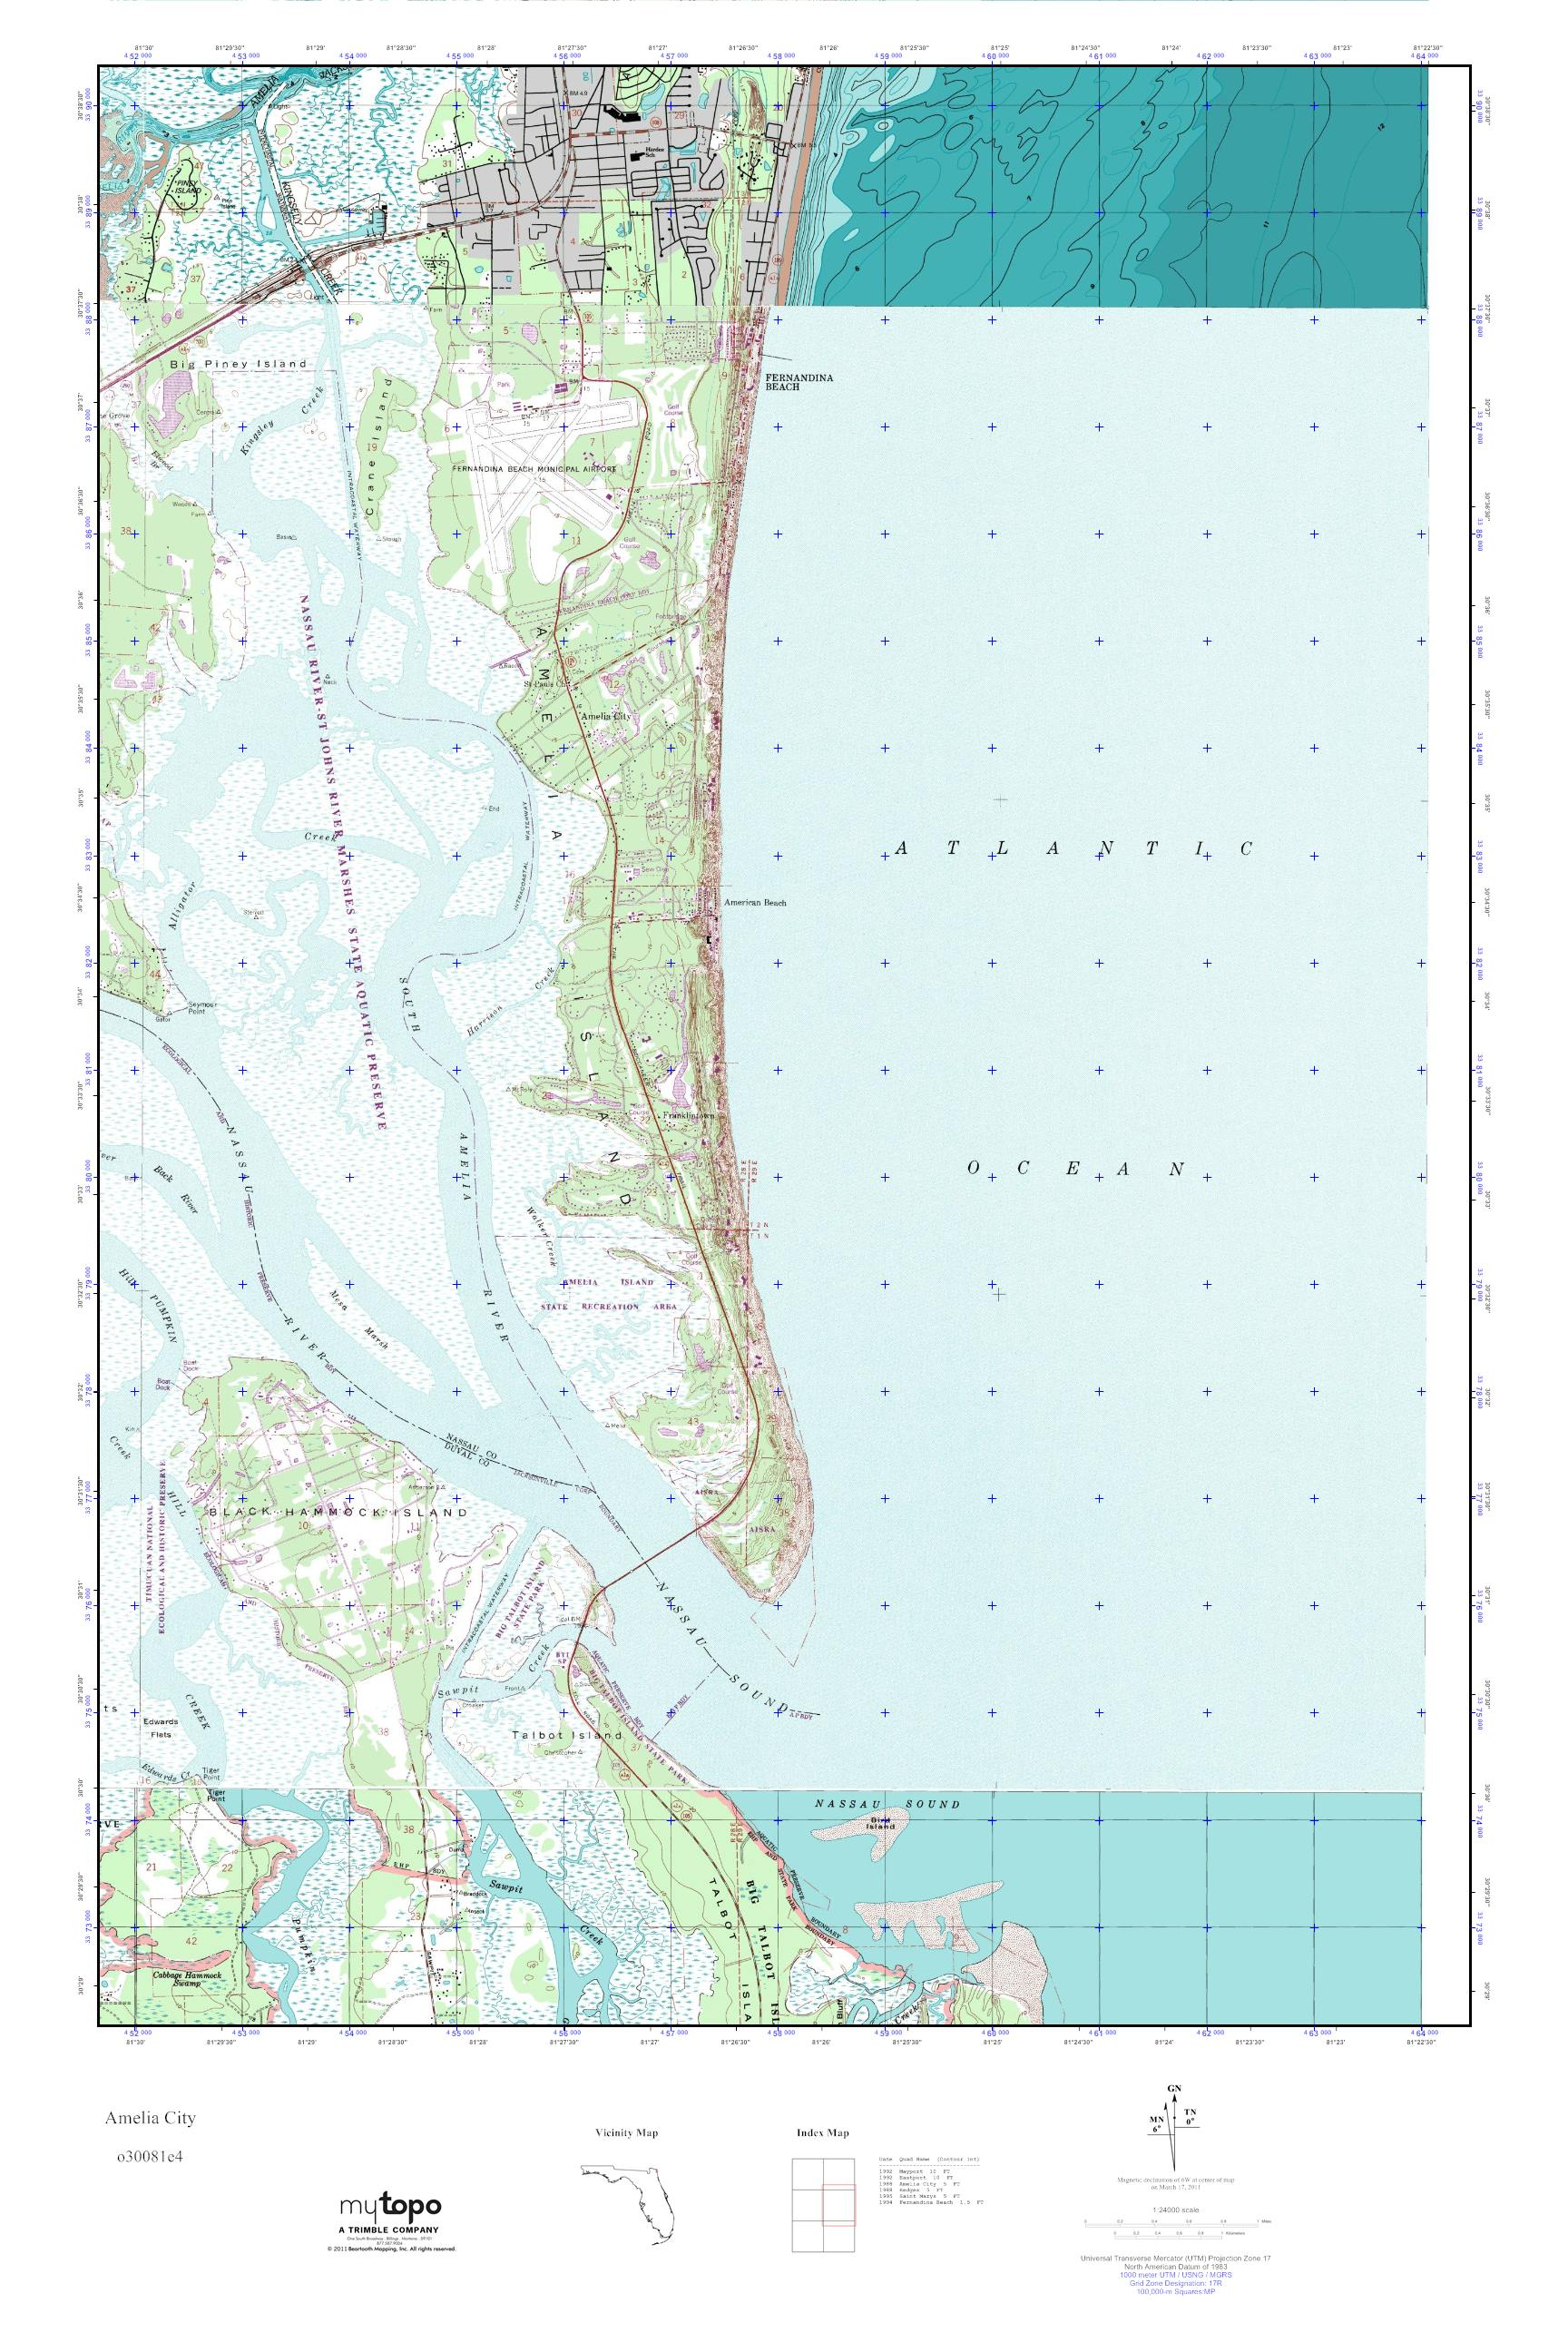 Amelia City Florida Map.Mytopo Amelia City Florida Usgs Quad Topo Map